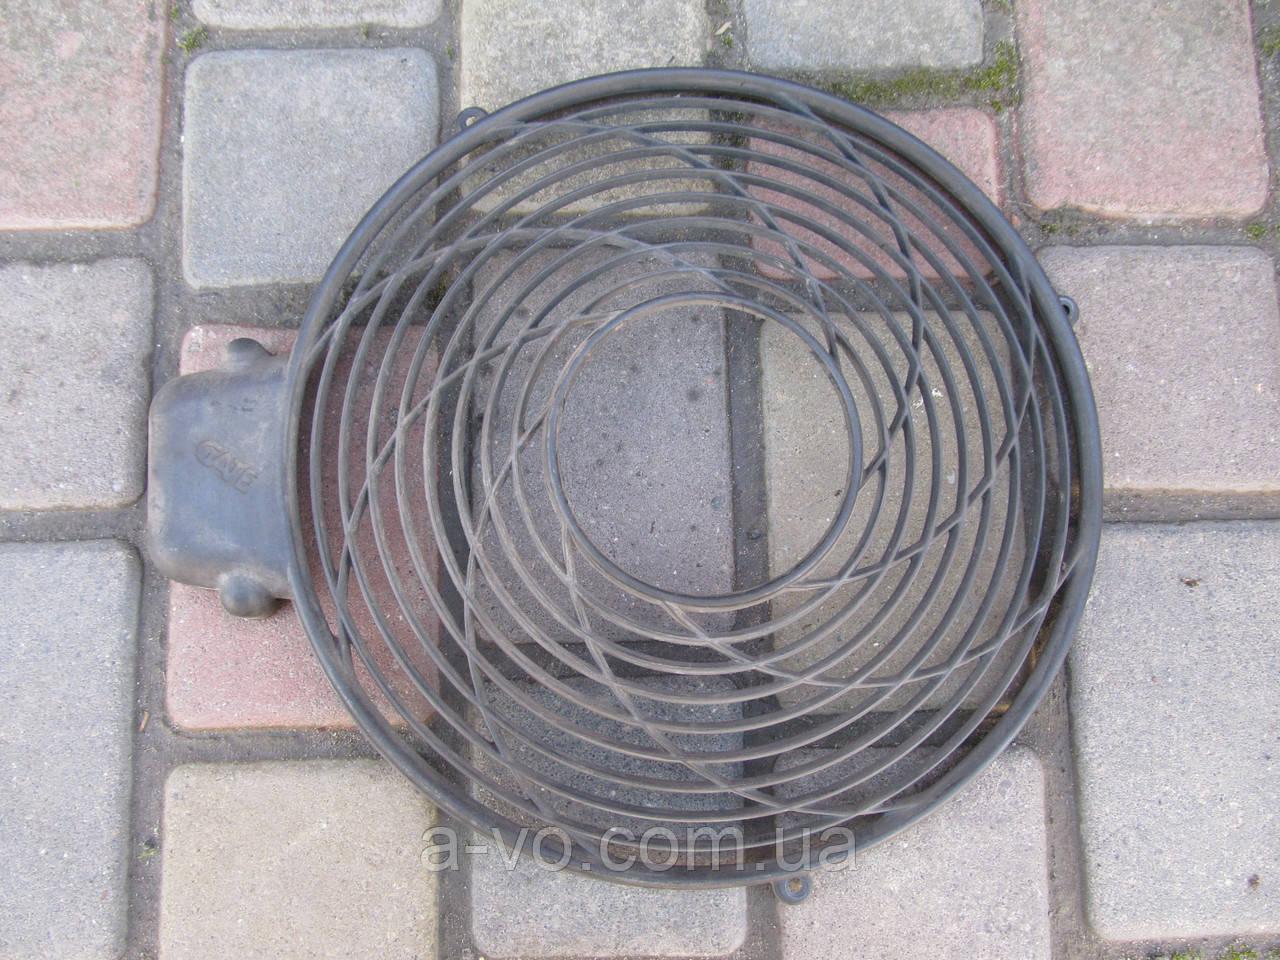 Защита вентилятора кондиционера для Opel Meriva A 1,3 1.7CDTi, 829.1107, 8291107